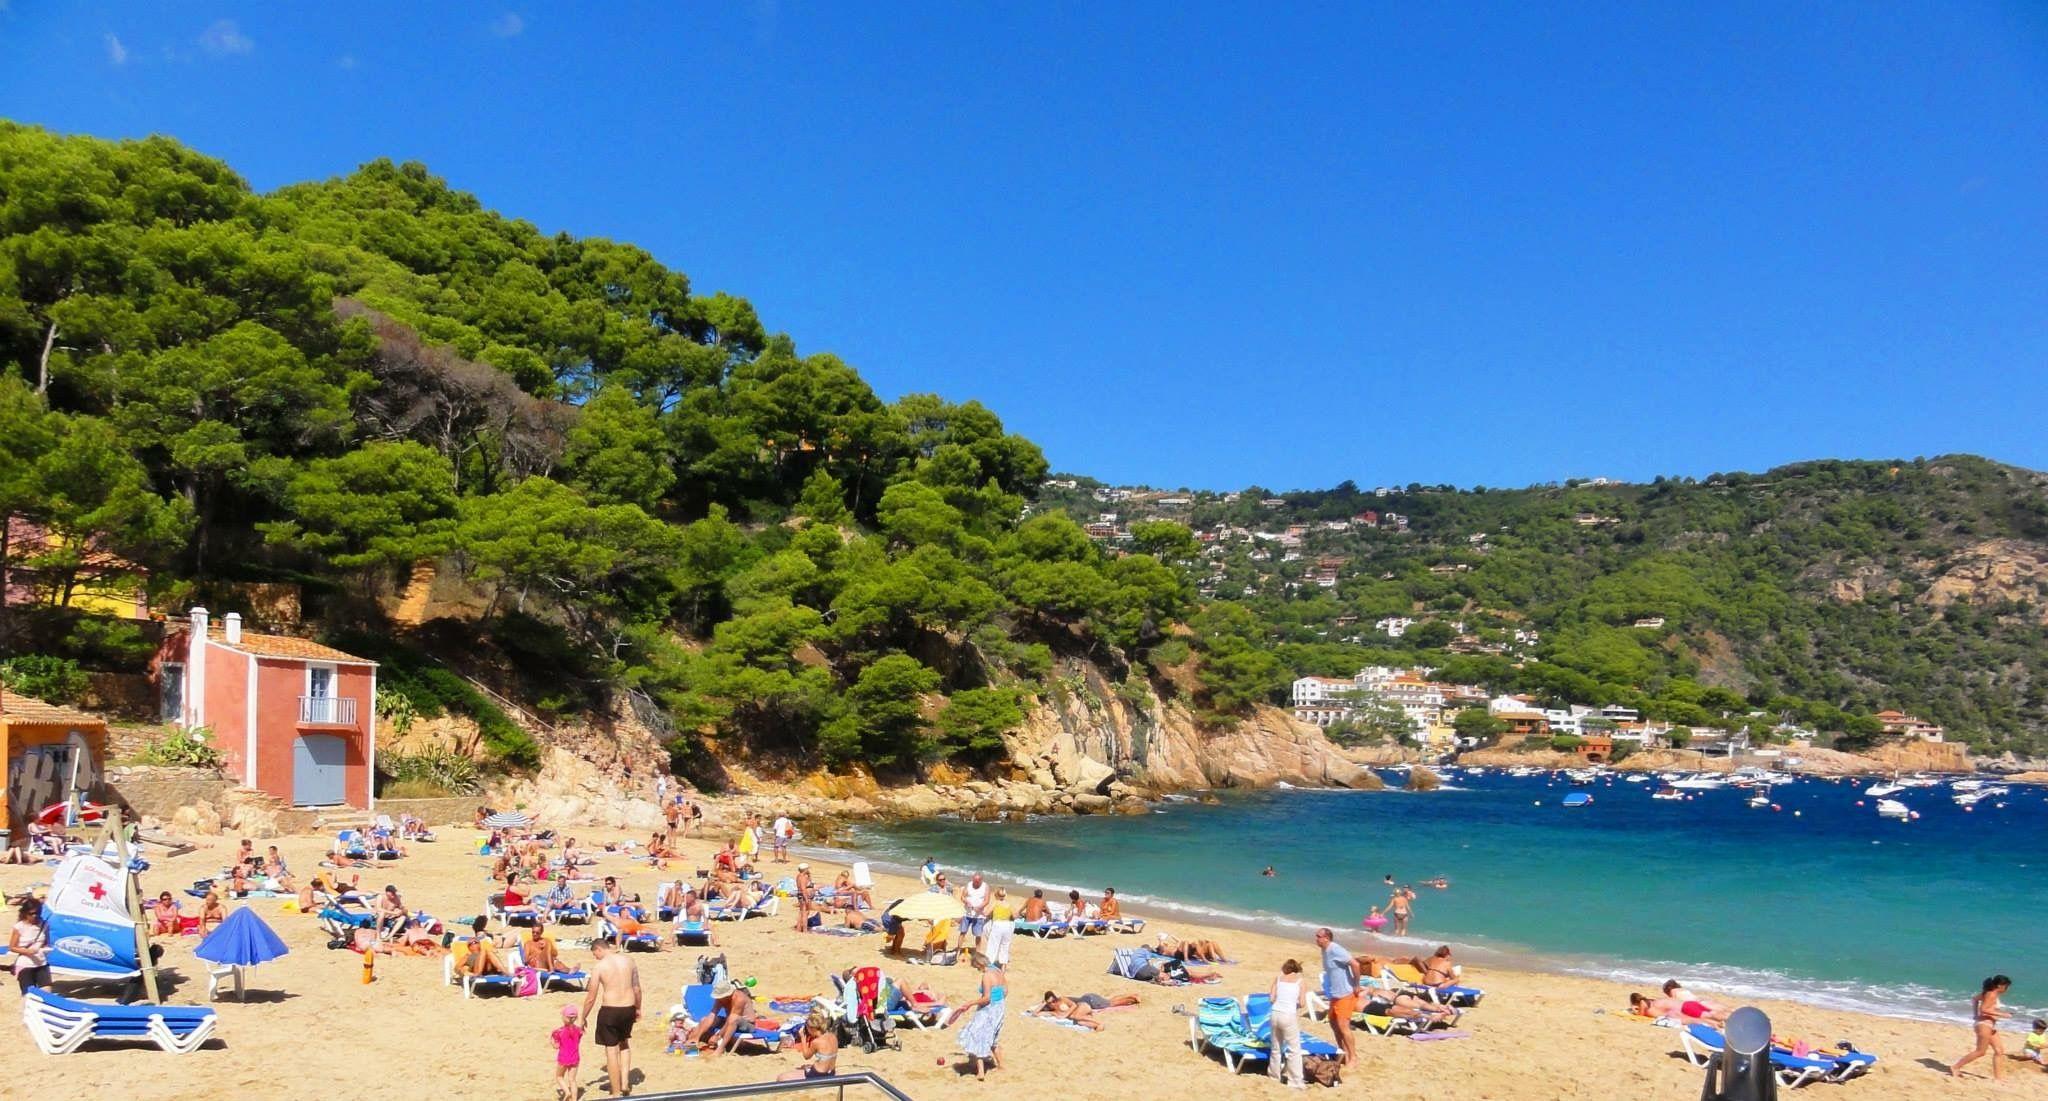 Nature beach resort quinta al gharb algarve beach portugal